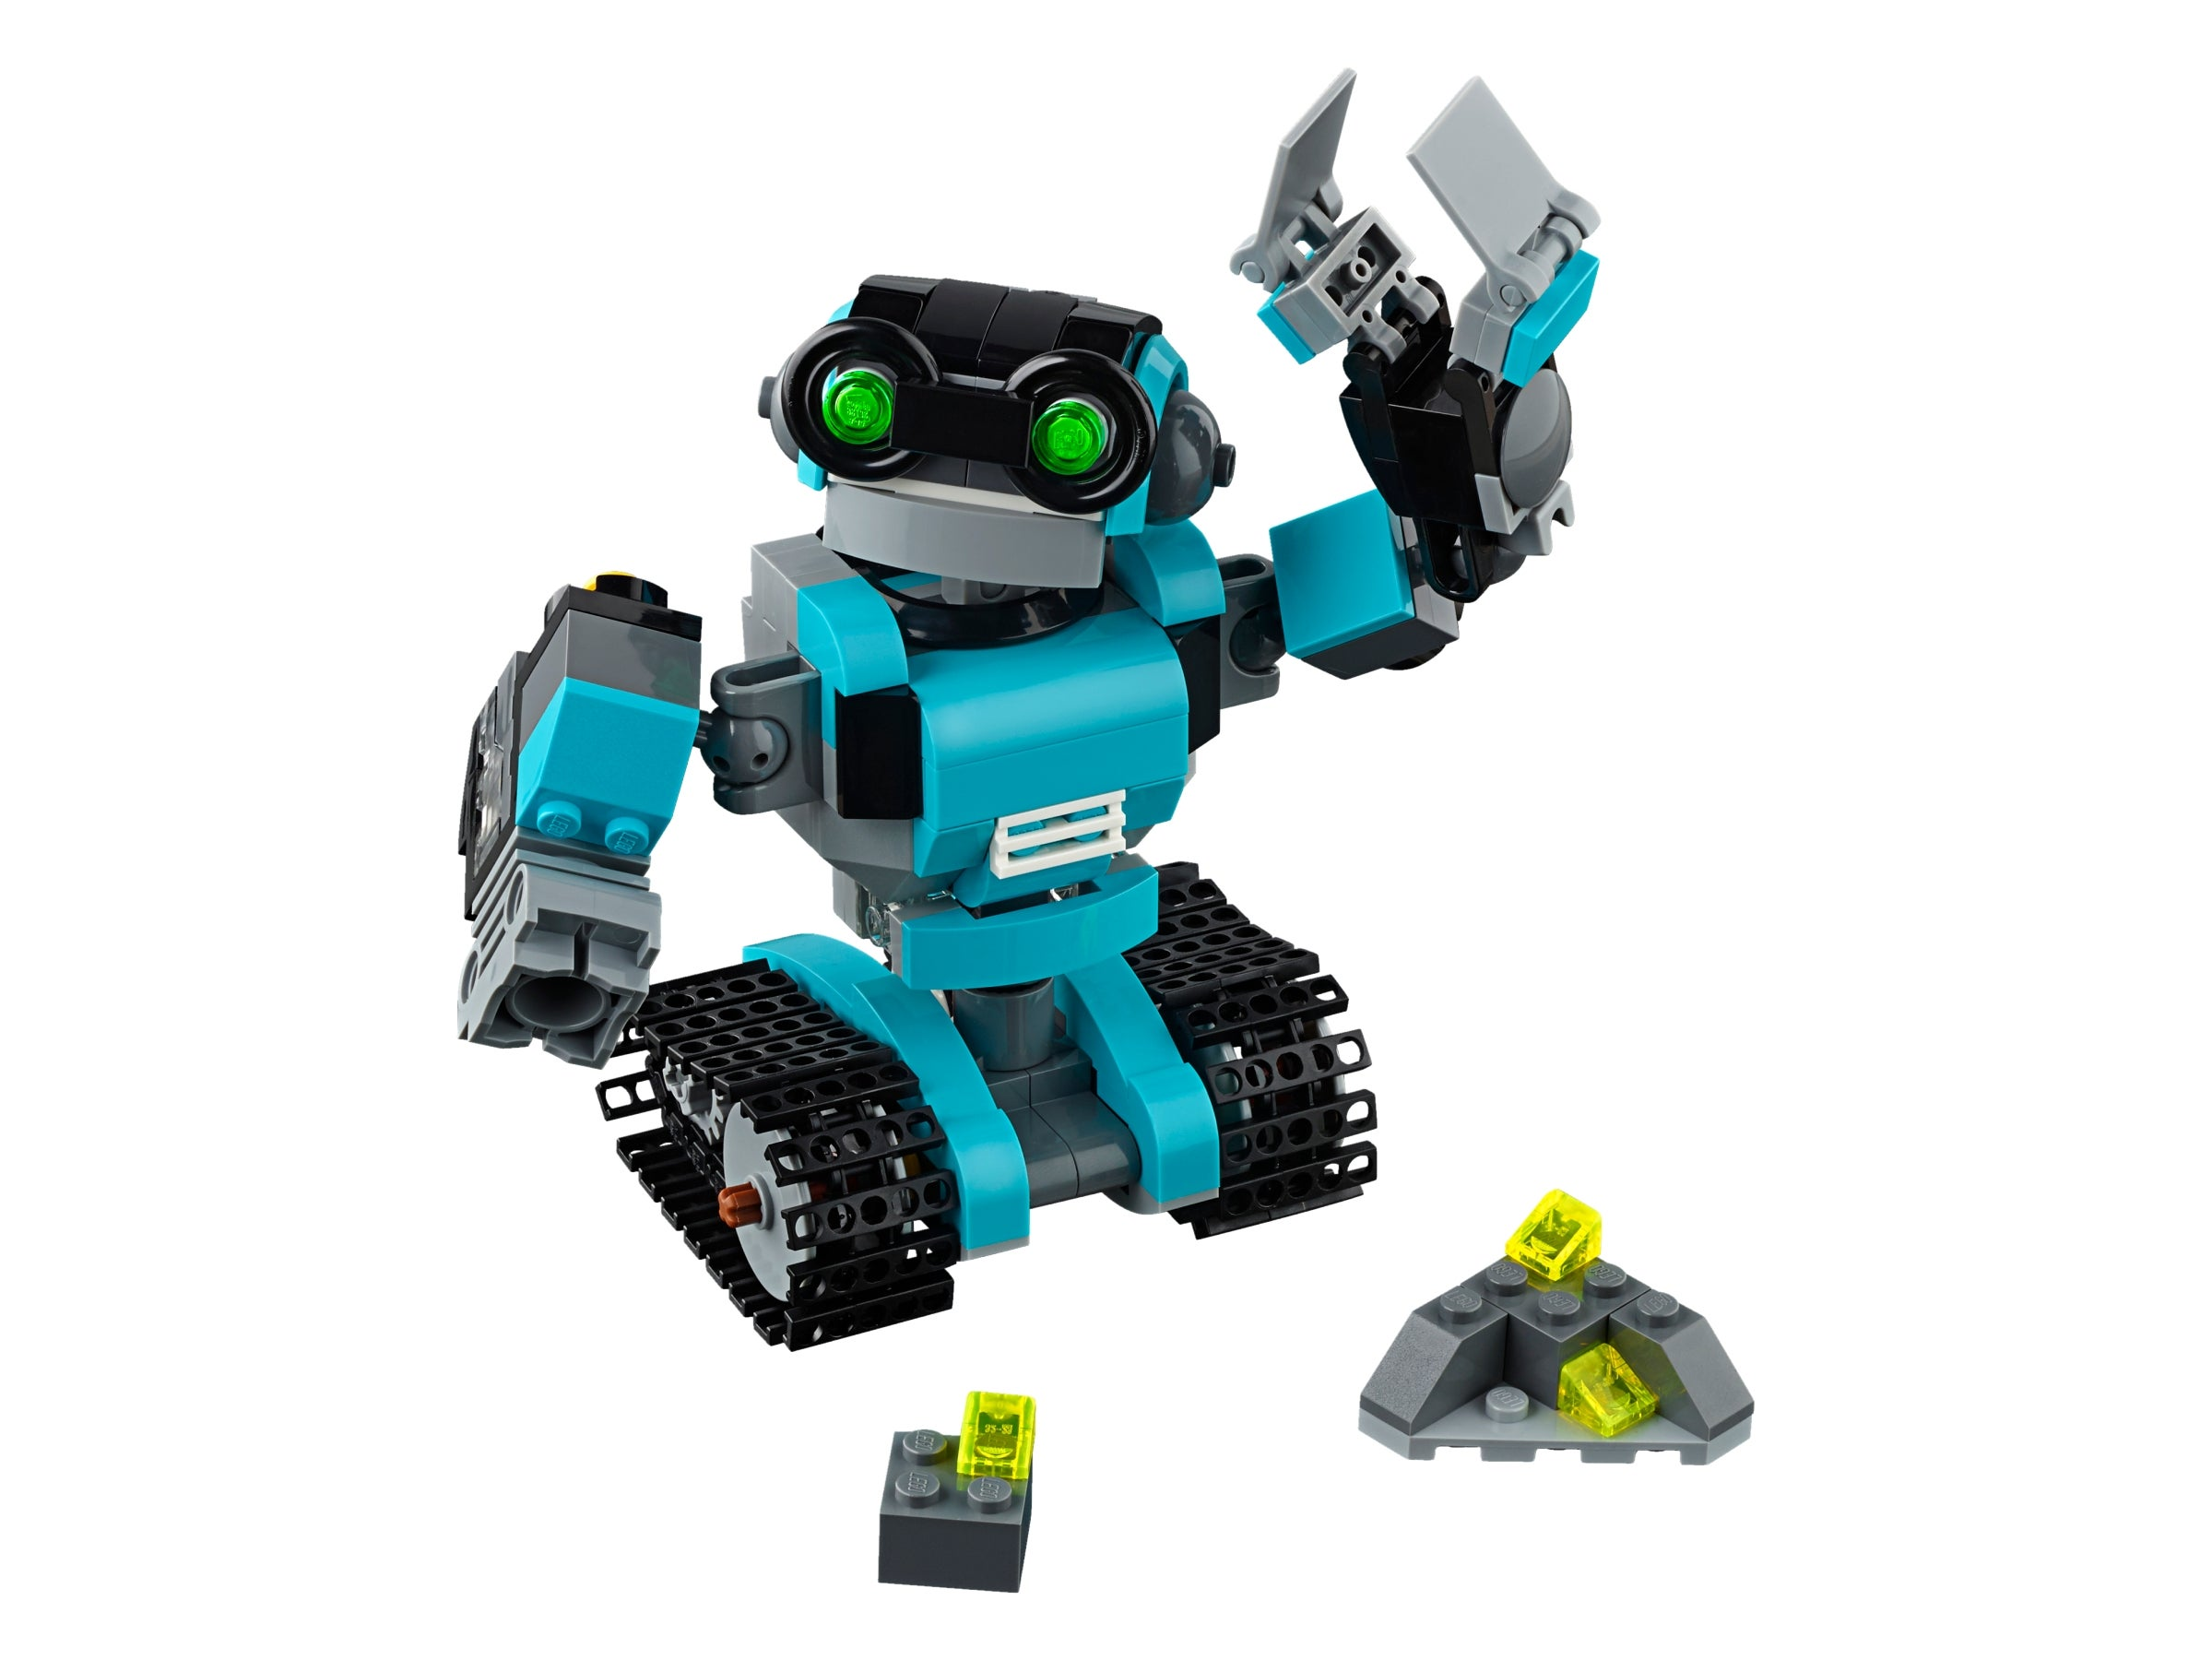 LEGO CREATOR 31062 Robo Explorer RETIRED 3 IN 1 MODEL WITH LIGHT BRICK